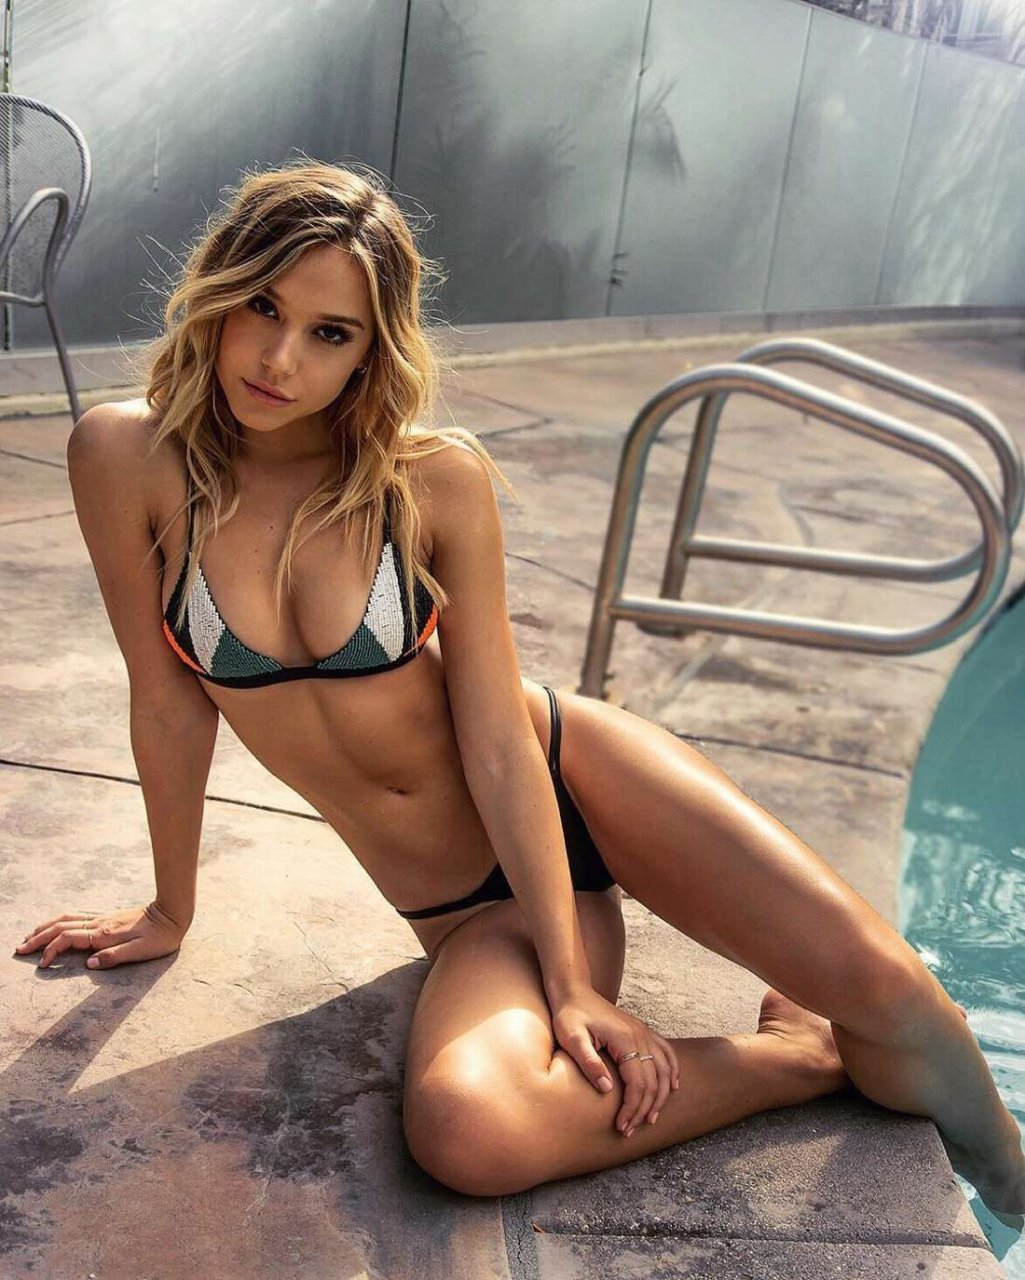 Alexis naked